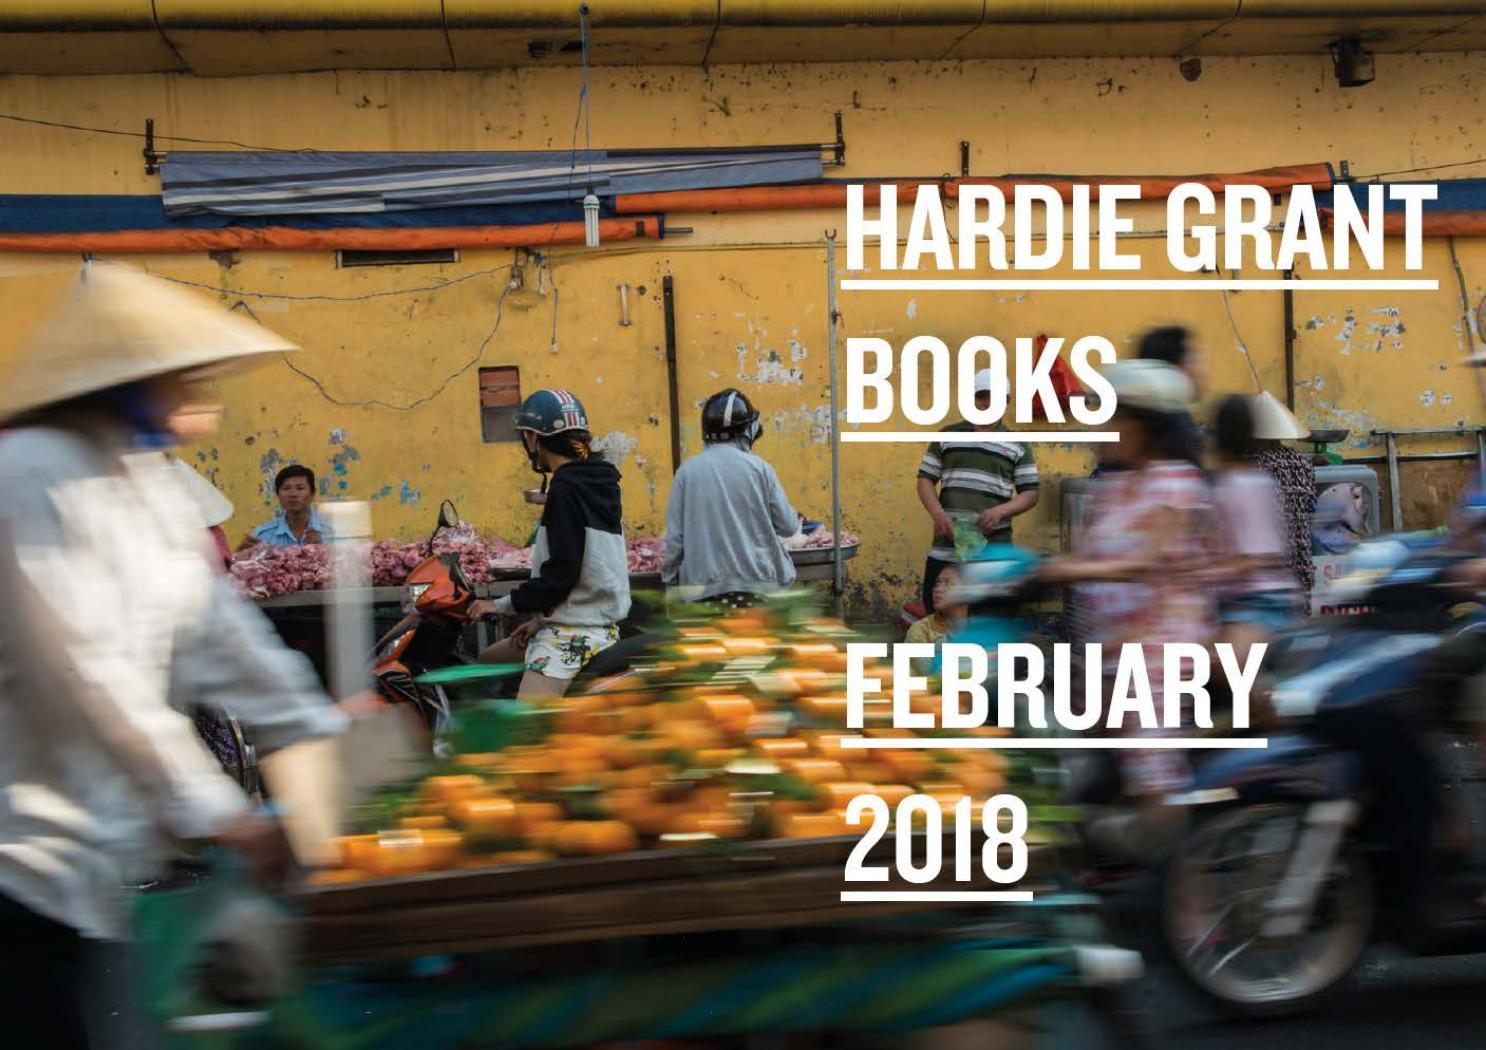 HGBooks February Kit 2018 By Hardie Grant Publishing